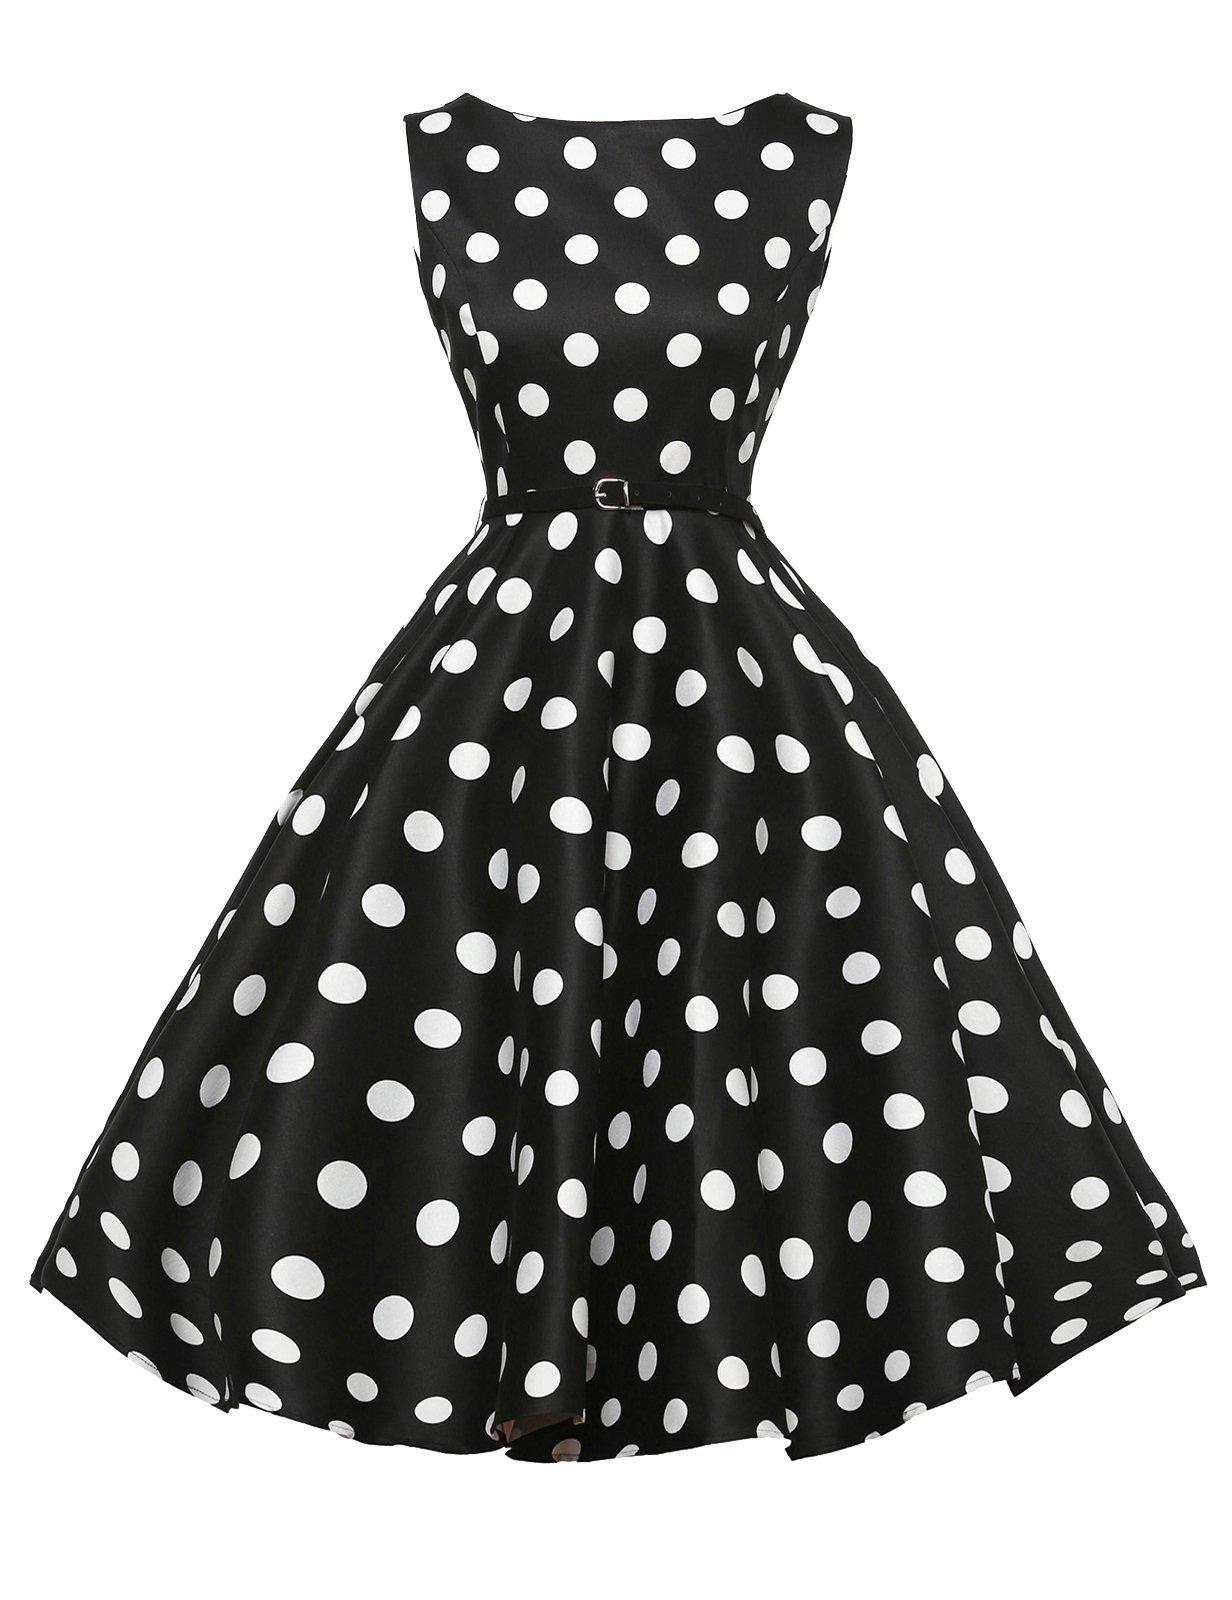 GRACE KARIN Boat Neck Retro Swing Dresses Hepburn Style Black Size L F-8